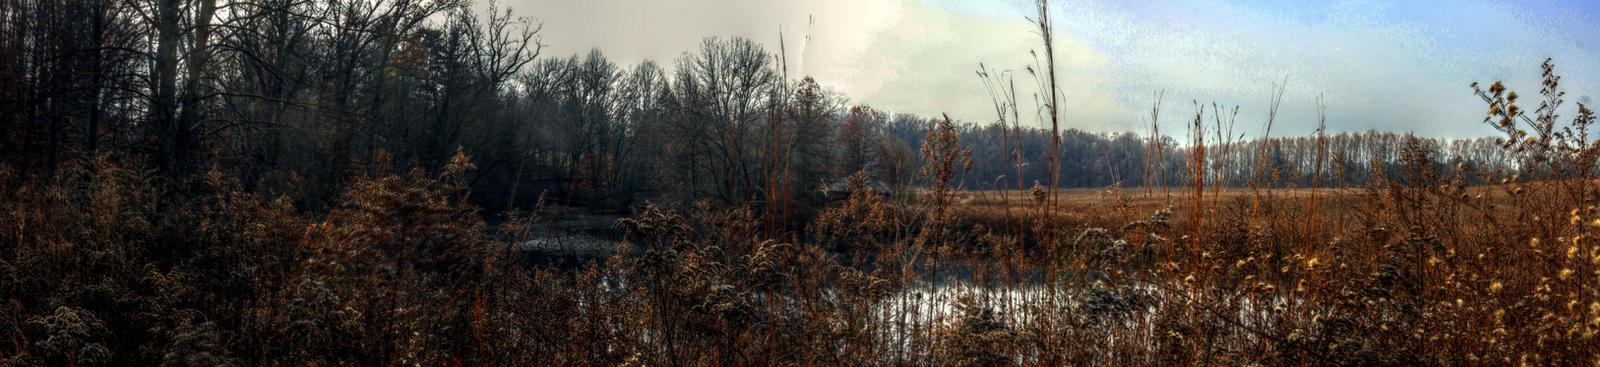 Panorama 3503 hdr pregamma 1 mantiuk06 contrast ma by bruhinb